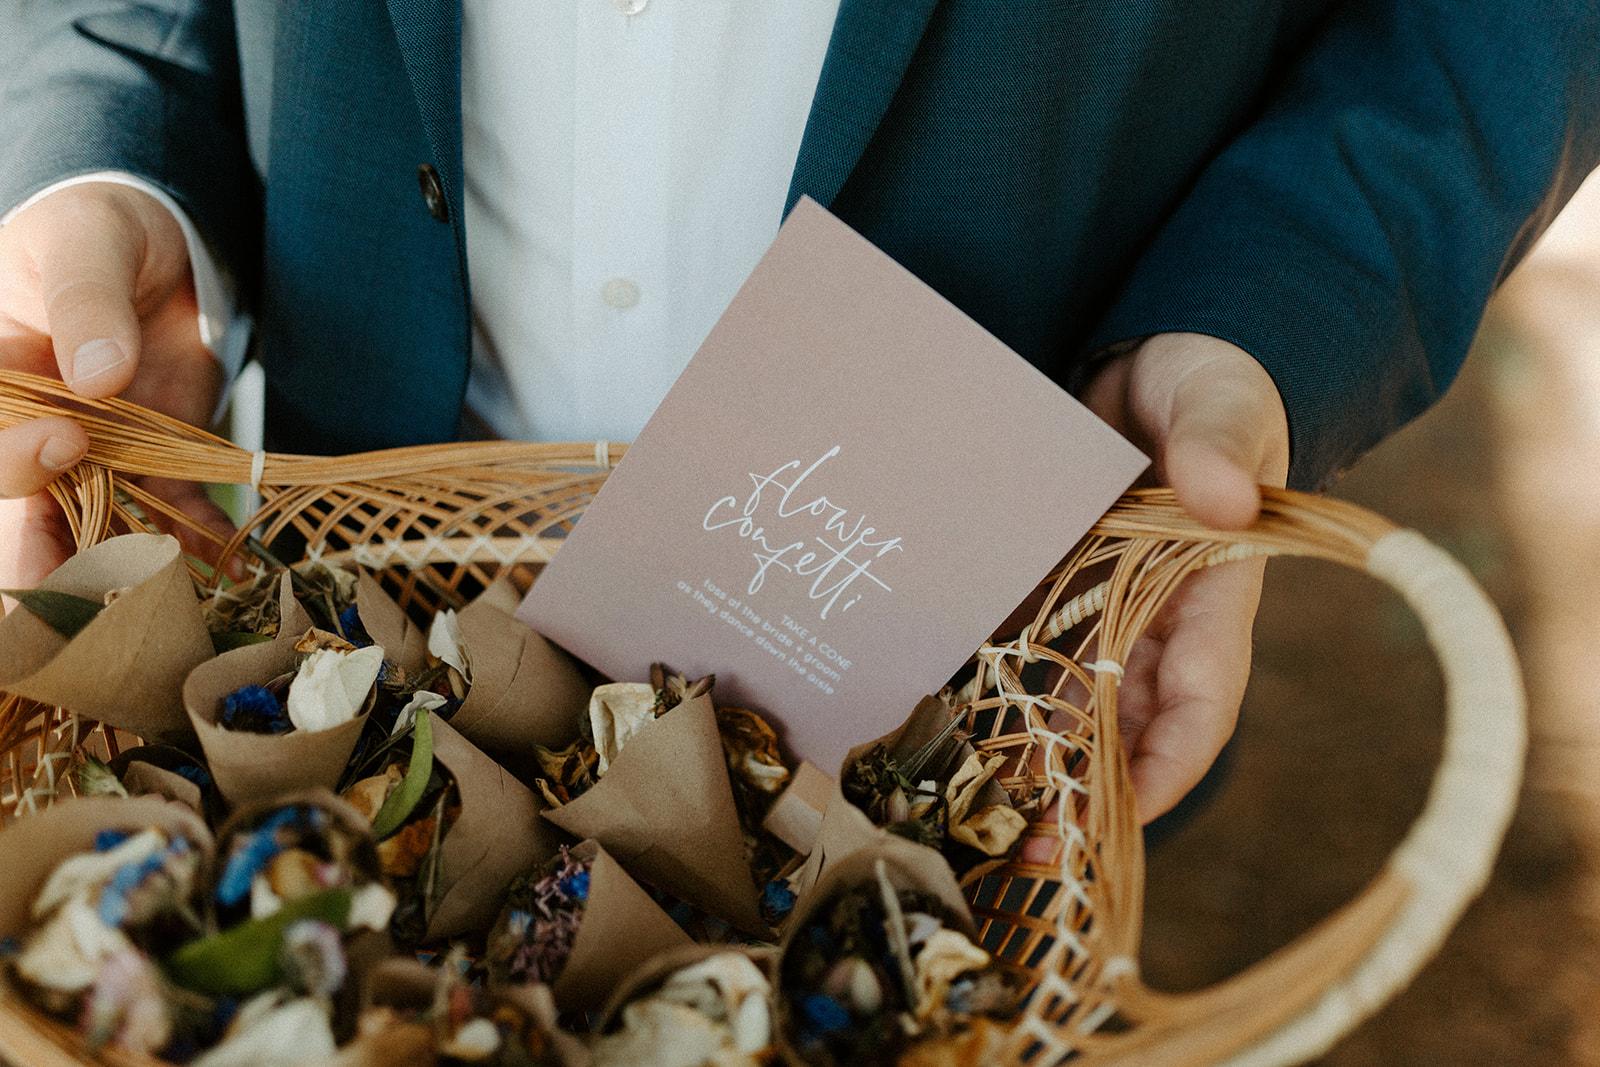 camp_wokanda_peoria_illinois_wedding_photographer_wright_photographs_bliese_0172.jpg